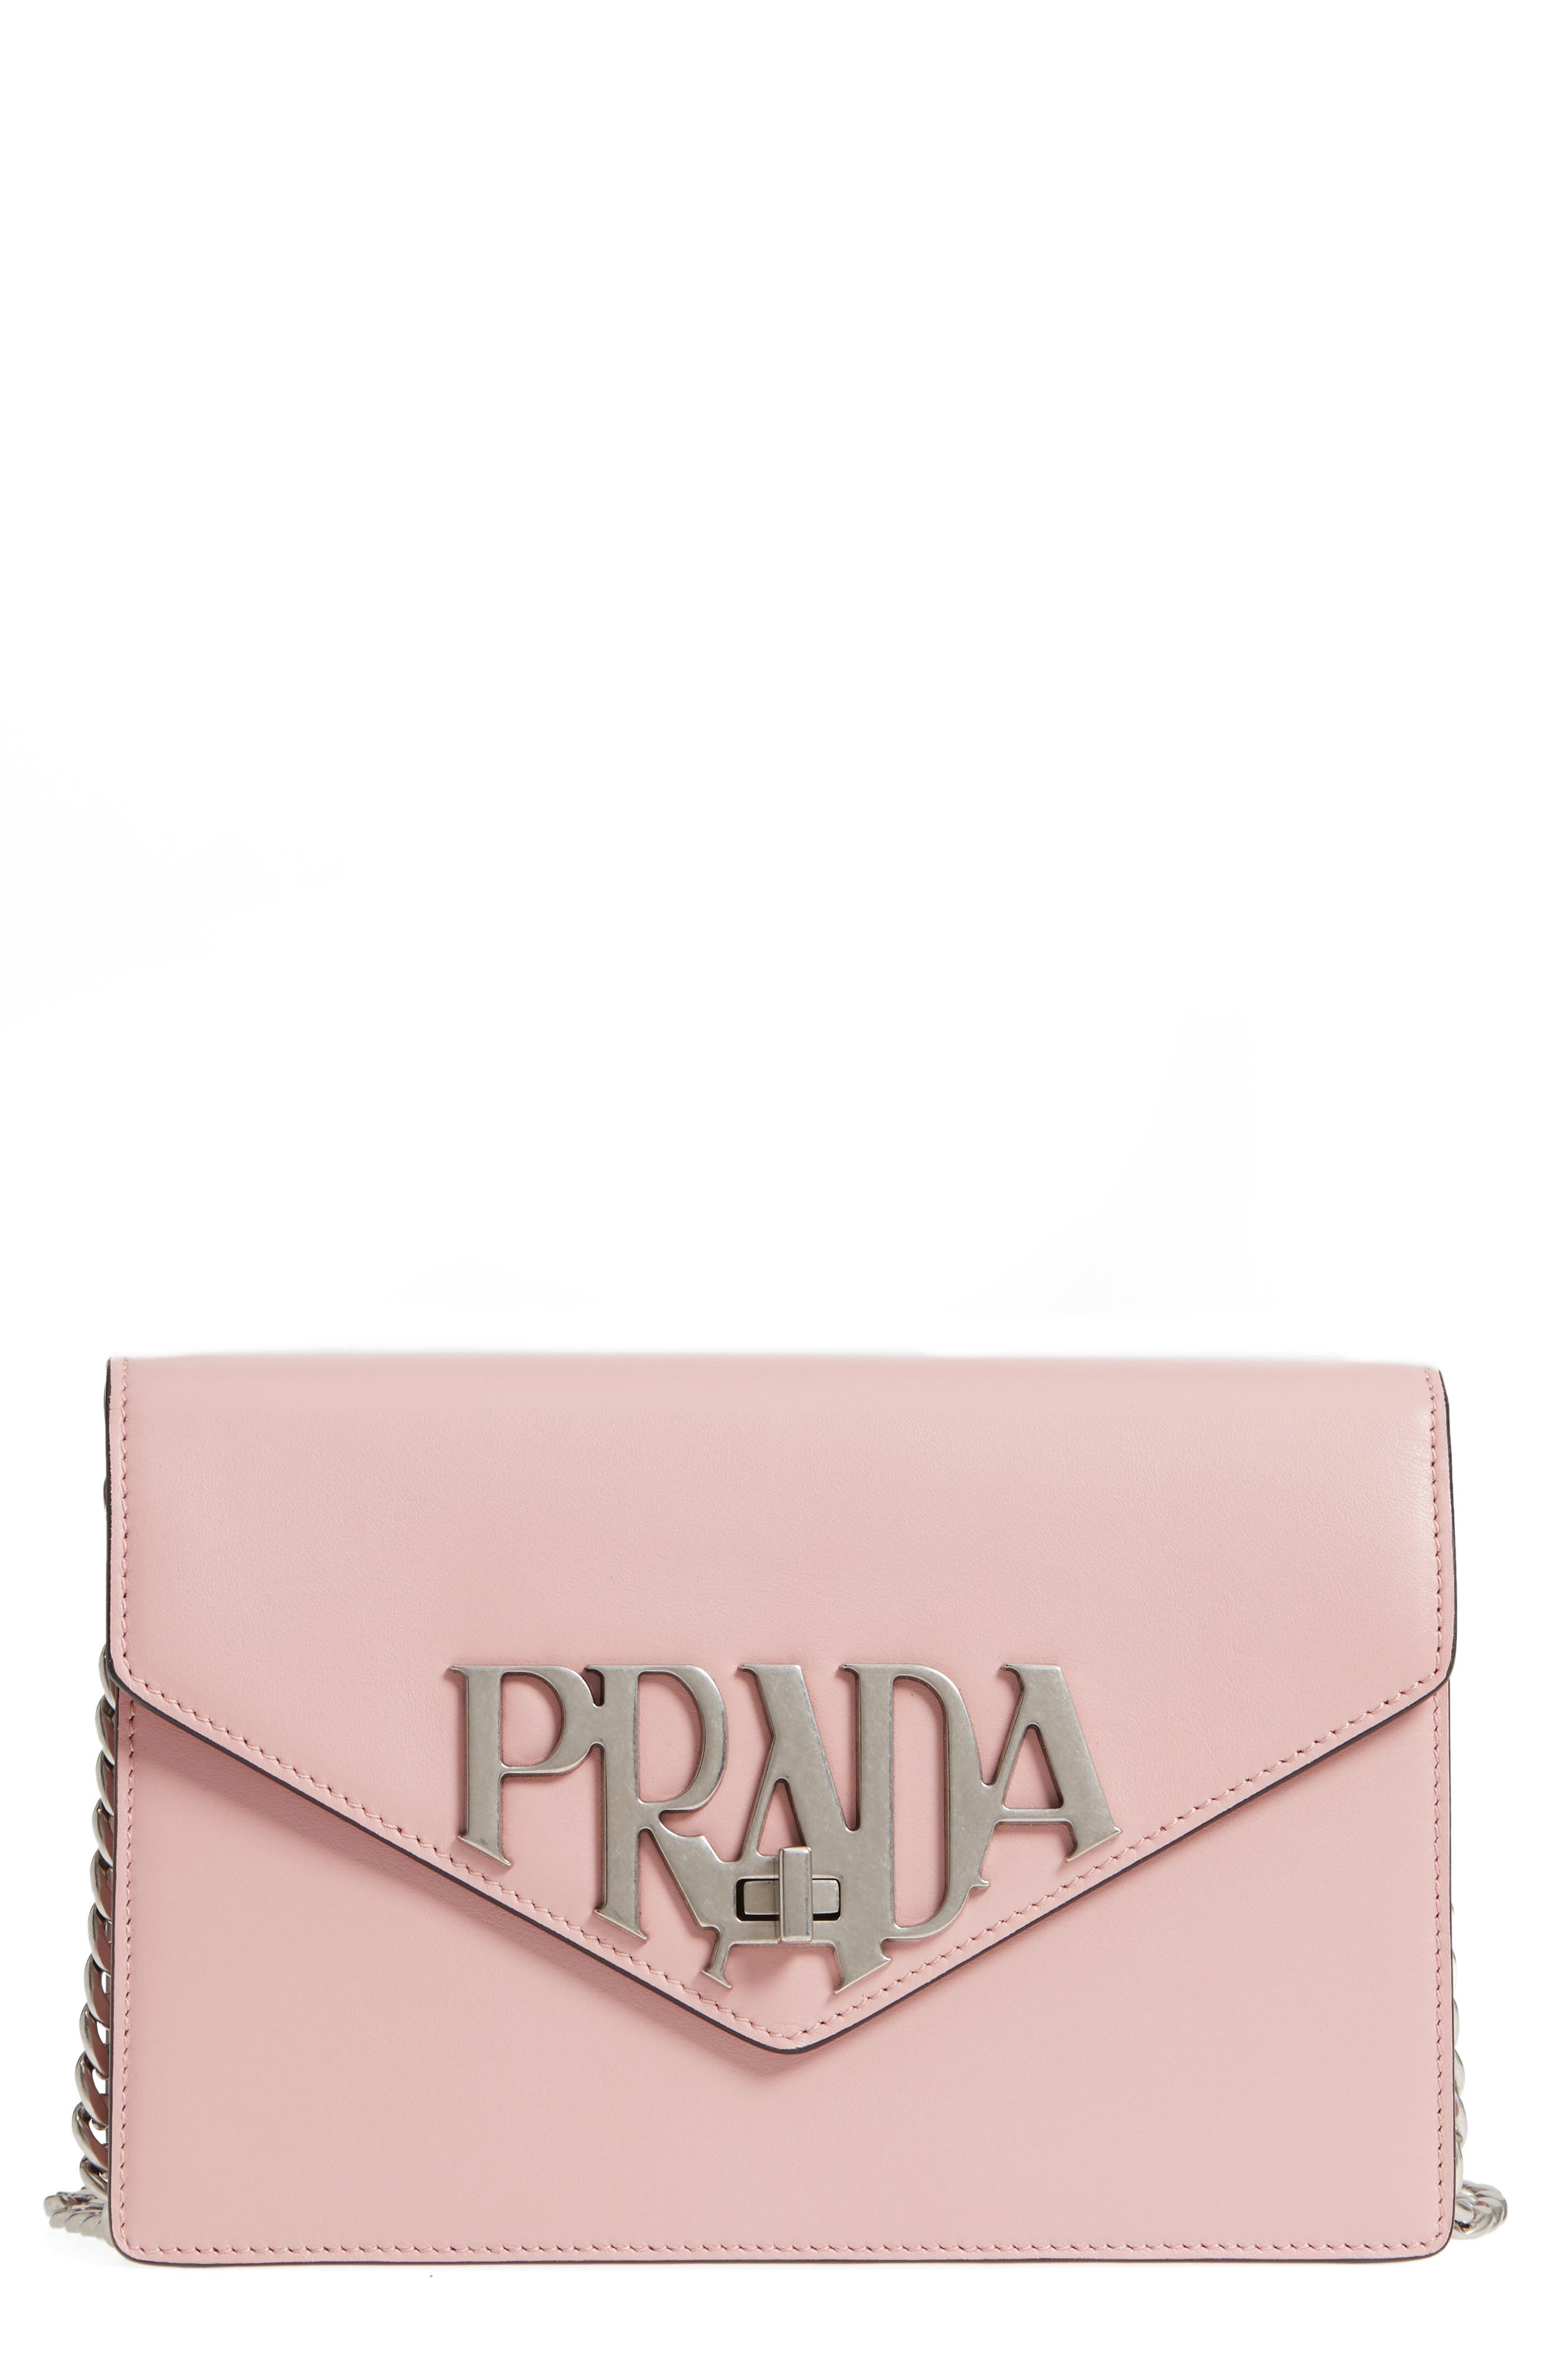 Main Image - Prada Deco Flap Calfskin Leather Clutch